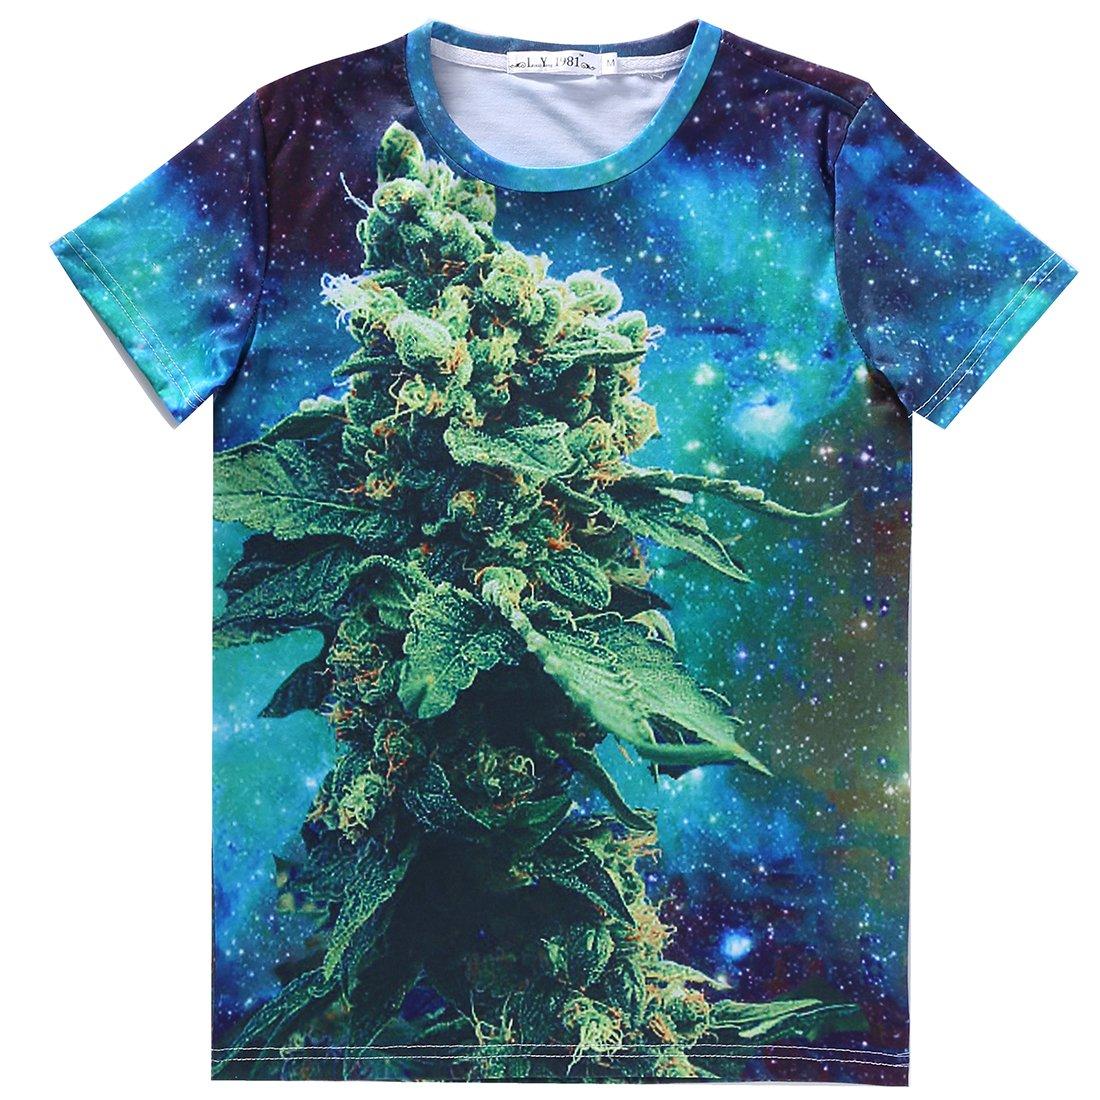 Unisex Marijuana Weed Galaxy T Shirt Clothing Women Men Size L